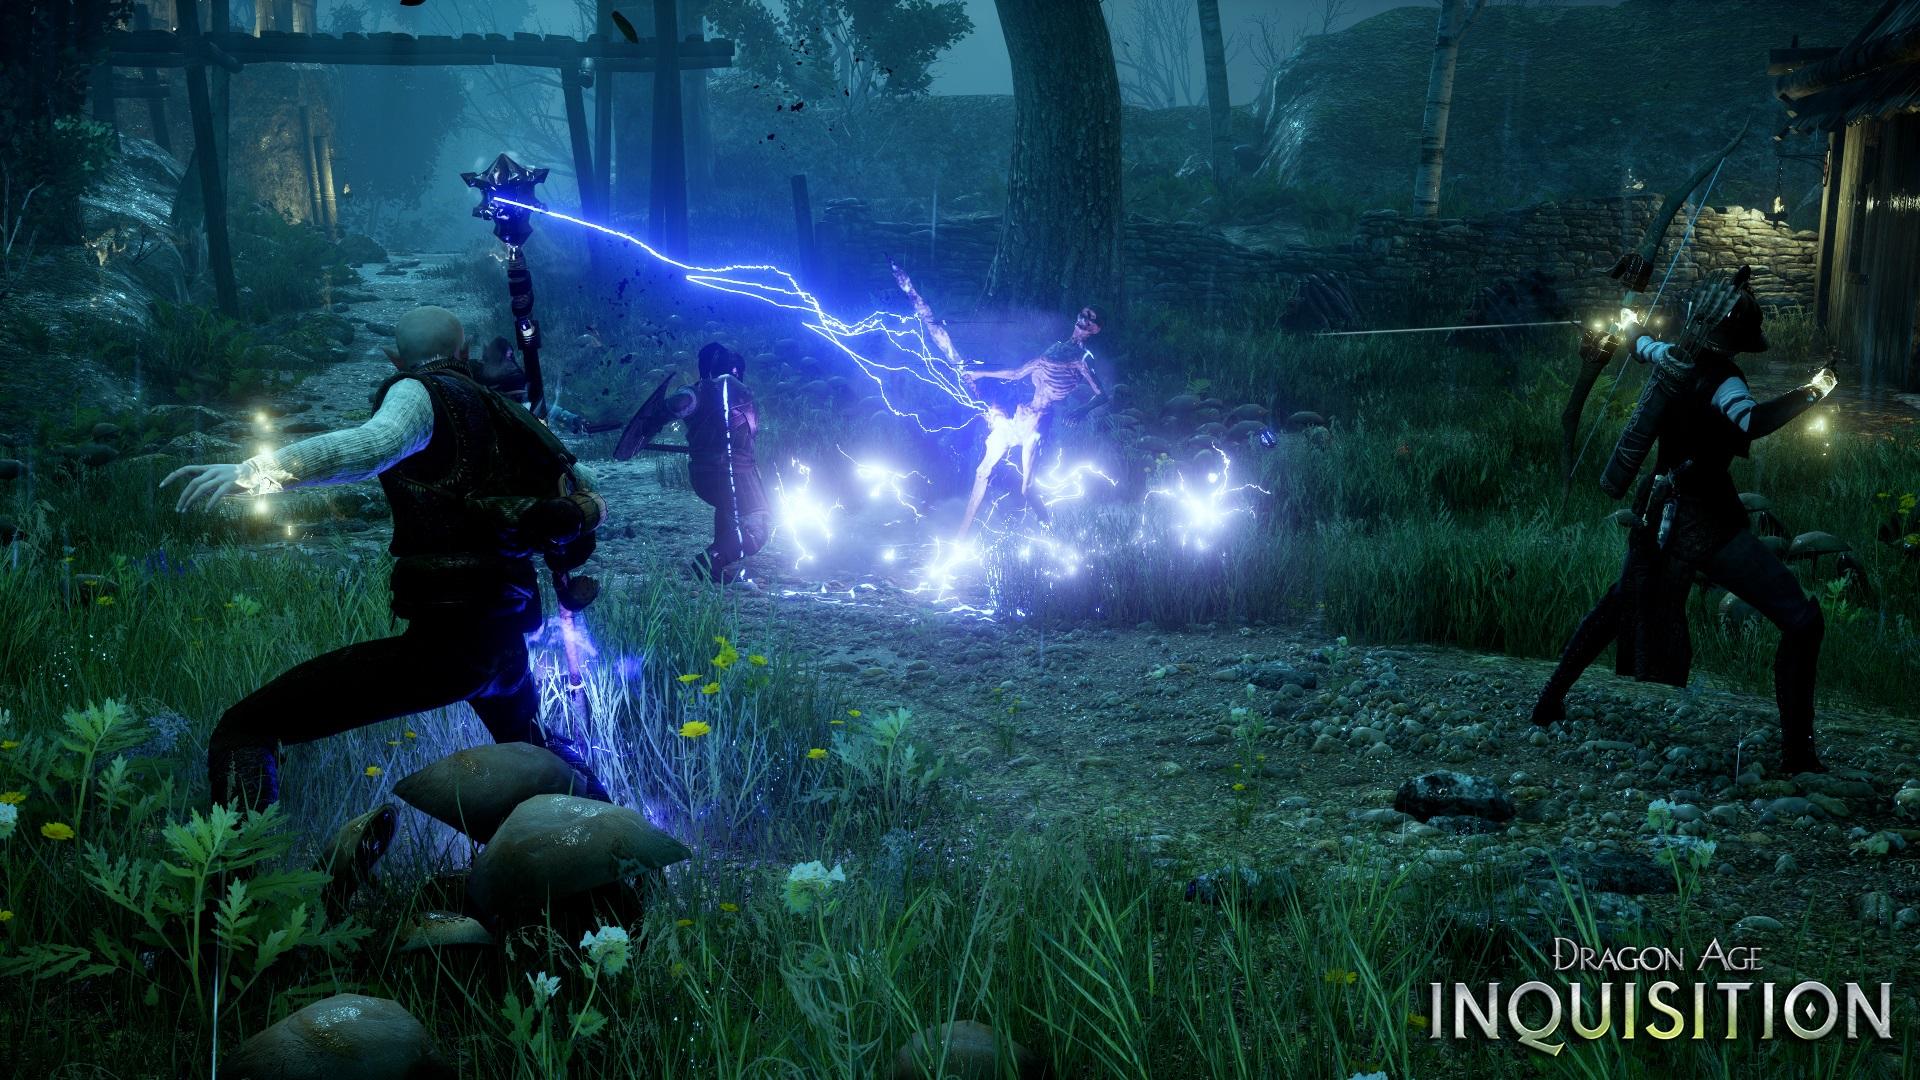 dragon-age-inquisition-goty-pc-screenshot-4